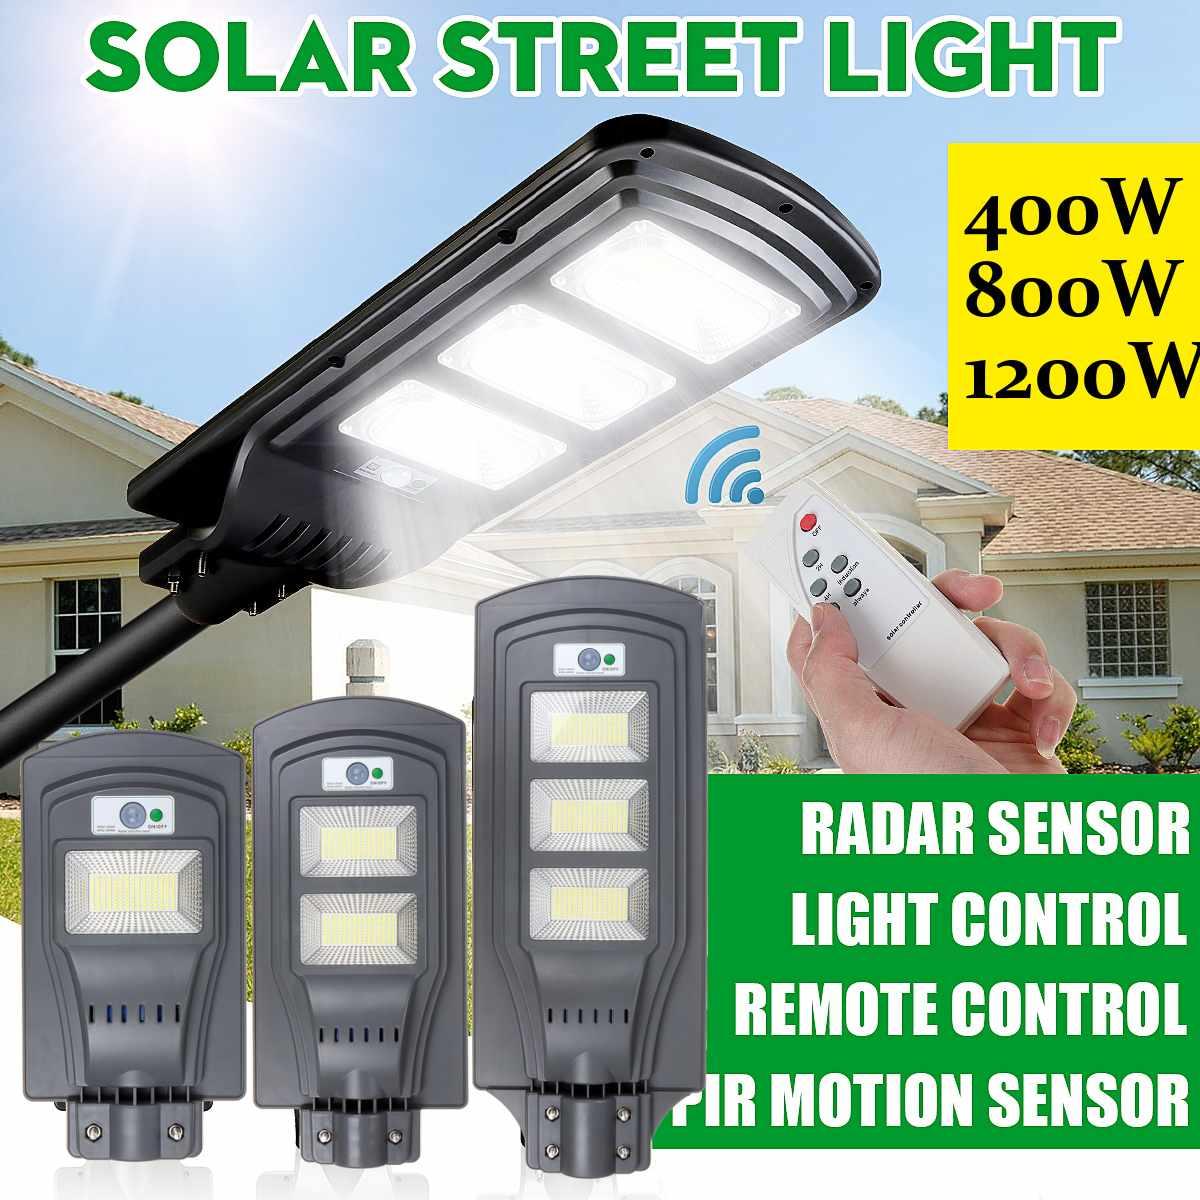 400W 800W 1200W LED Solar Street Light Remote Control PIR Motion Sensor Waterproof IP65 Outdoor Lighting Garden Road Wall Lamp 1